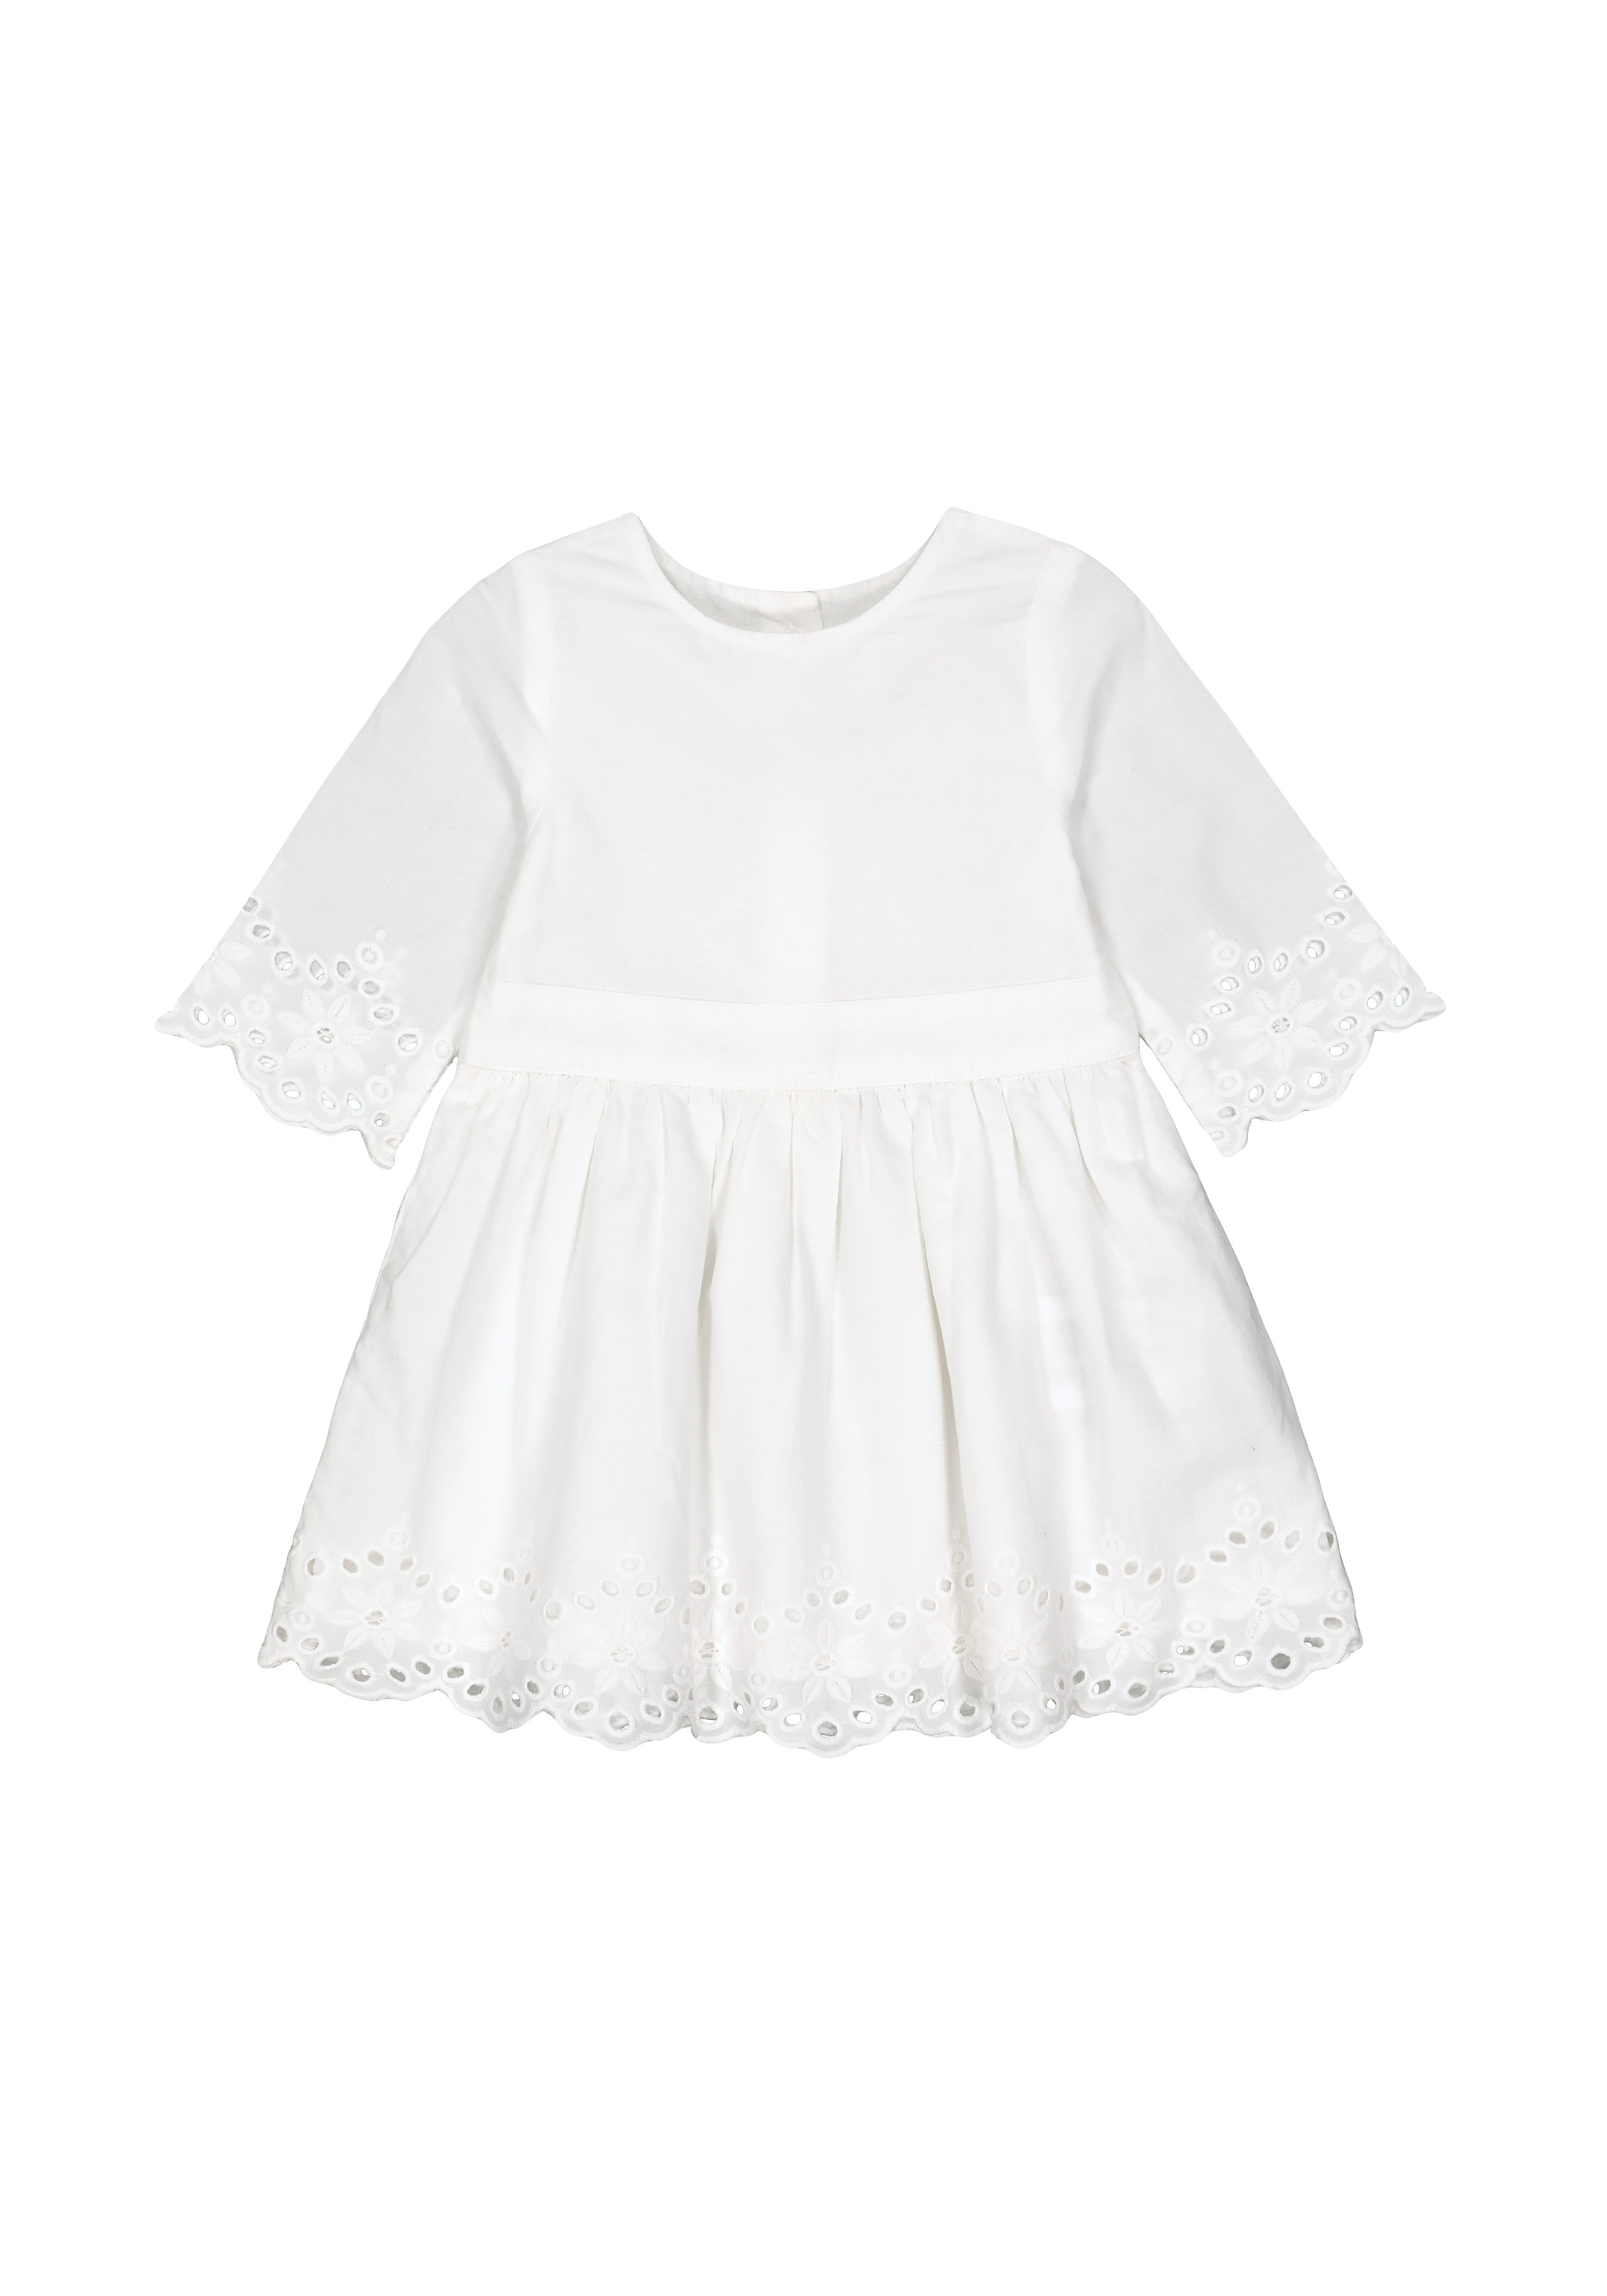 Mothercare | Girls White Broderie Dress - White